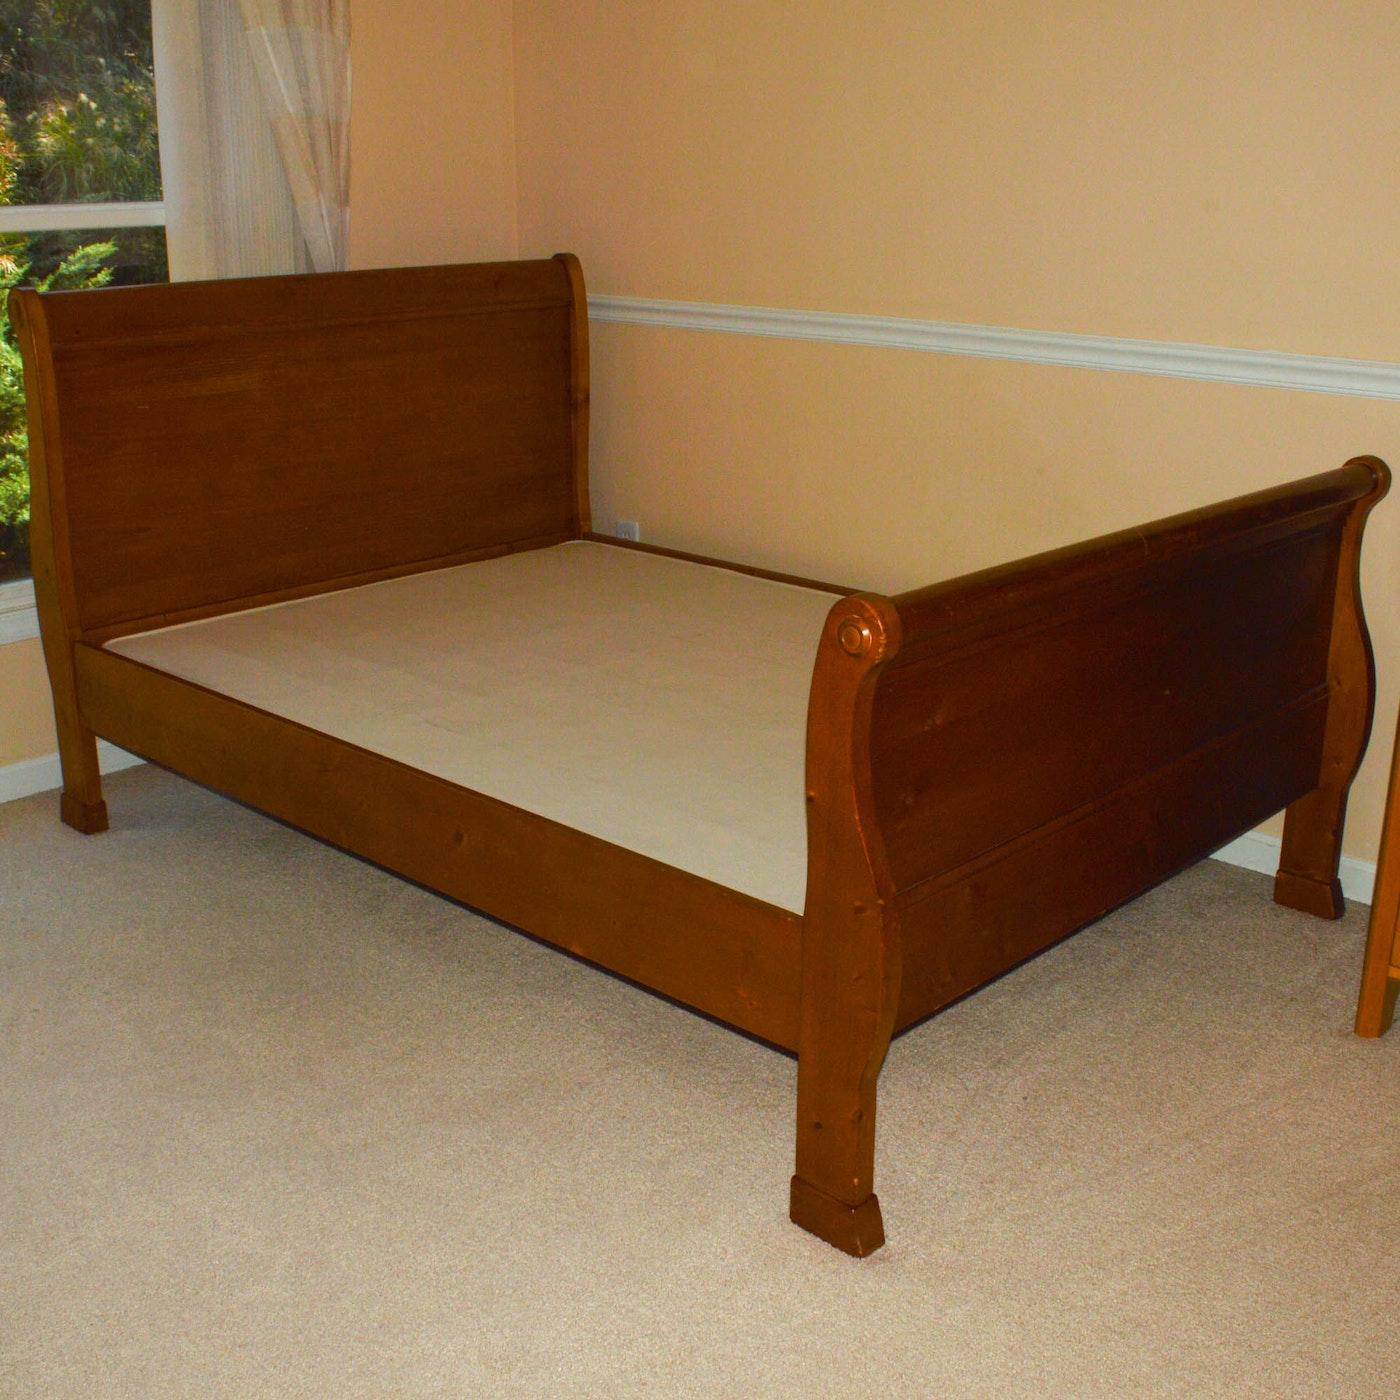 pottery barn kids full size sleigh bed ebth. Black Bedroom Furniture Sets. Home Design Ideas